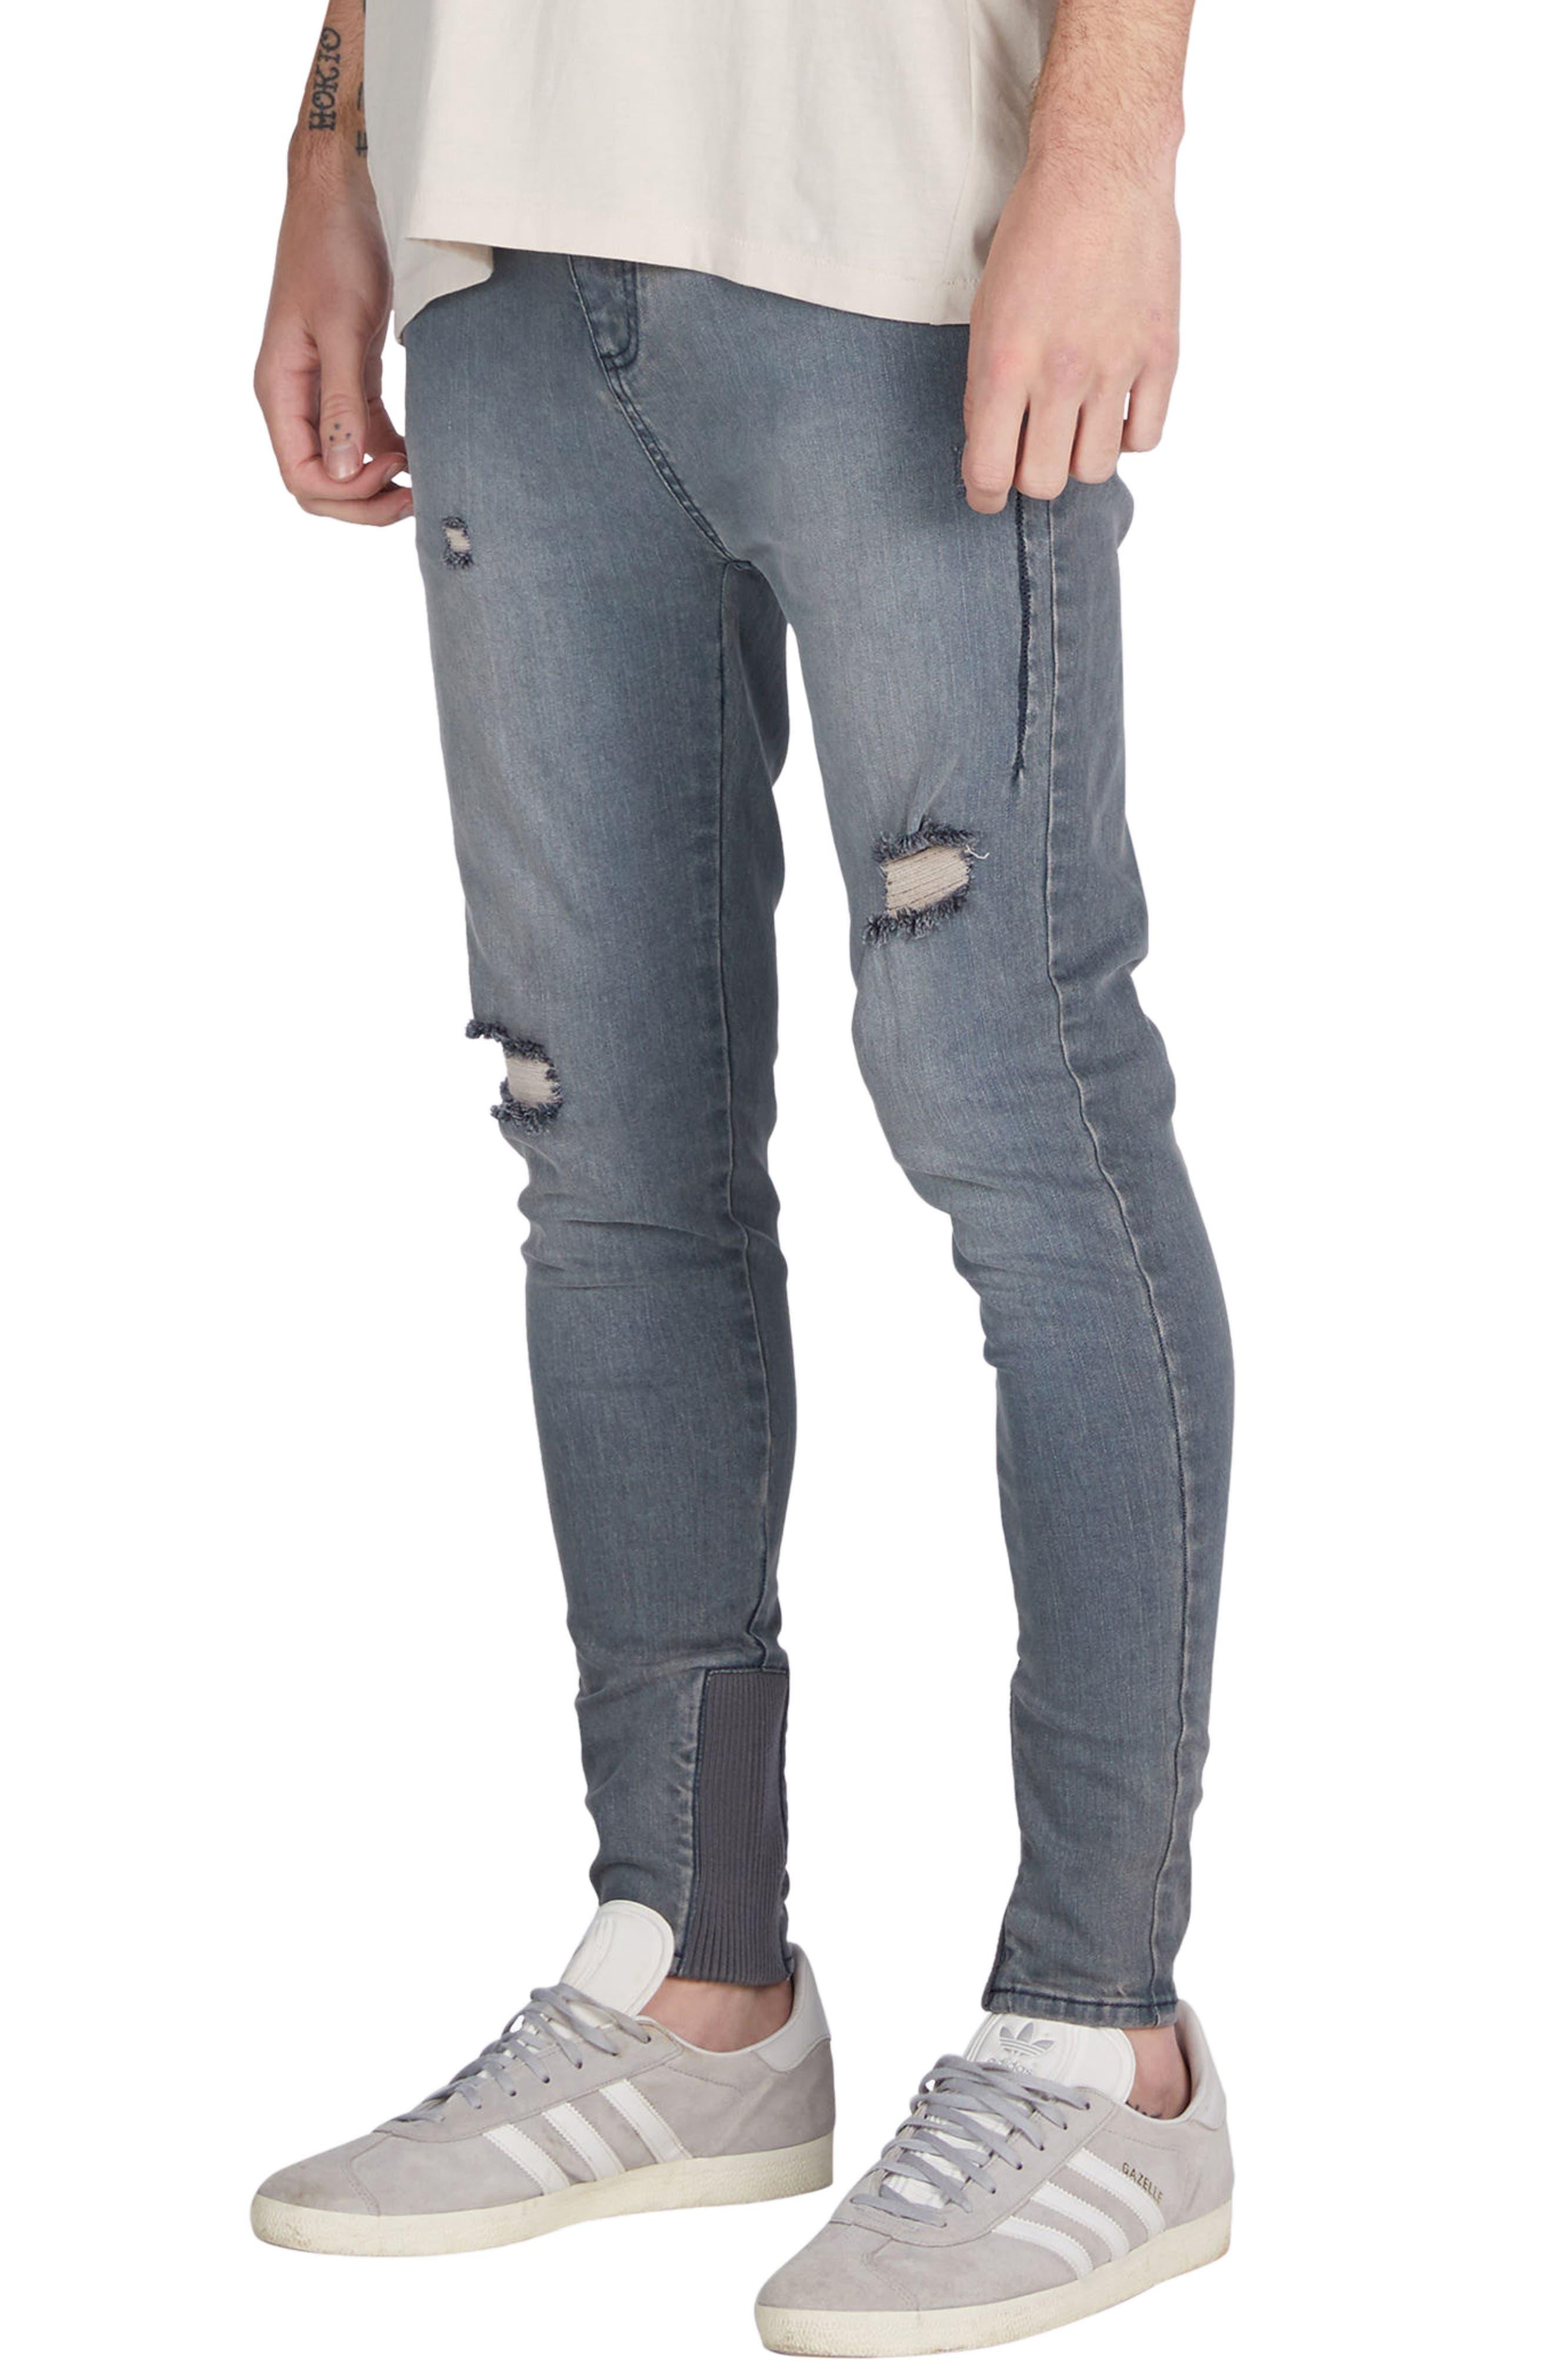 Sharpshot Slouchy Skinny Fit Denim Pants,                             Alternate thumbnail 4, color,                             Blue Grey